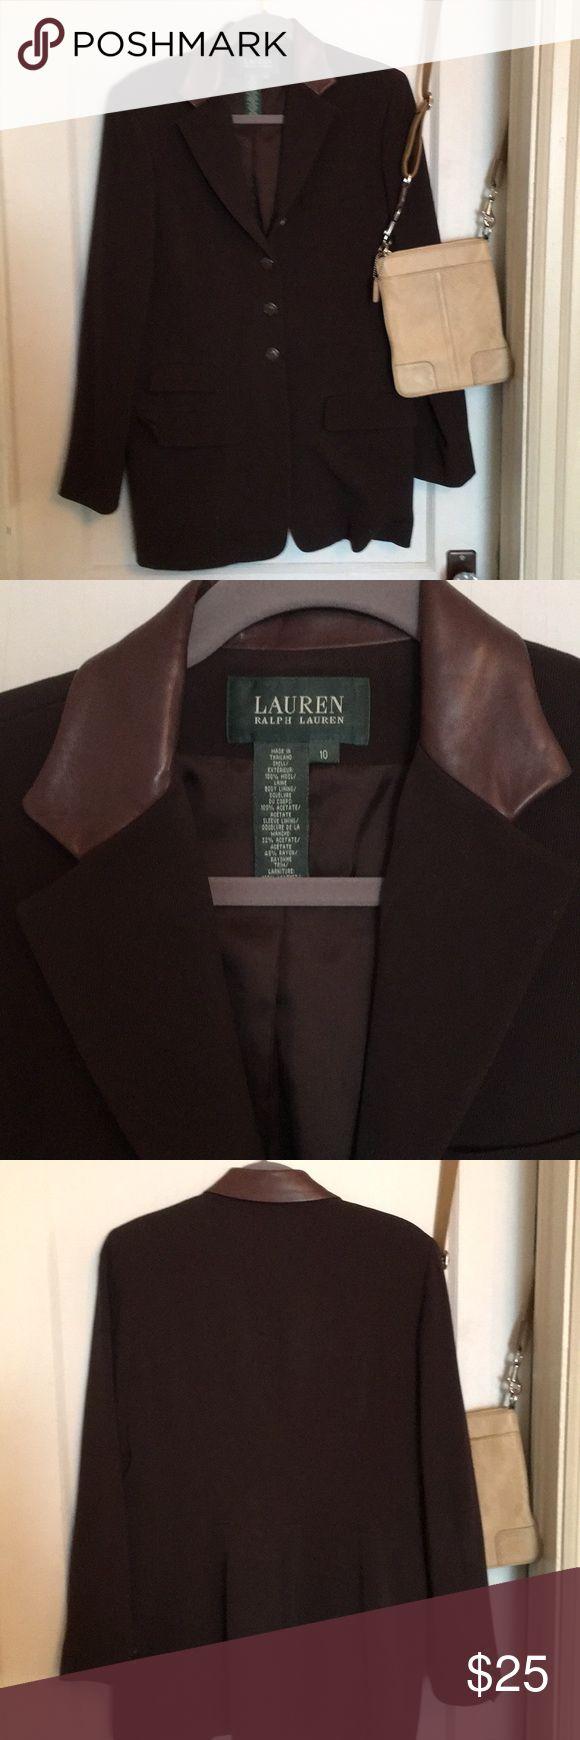 "Brown suit jacket leather collar  size 10 woman Great shape  Across bust 19"" Length 30"" from collar in back Lauren Ralph Lauren Jackets & Coats Blazers"